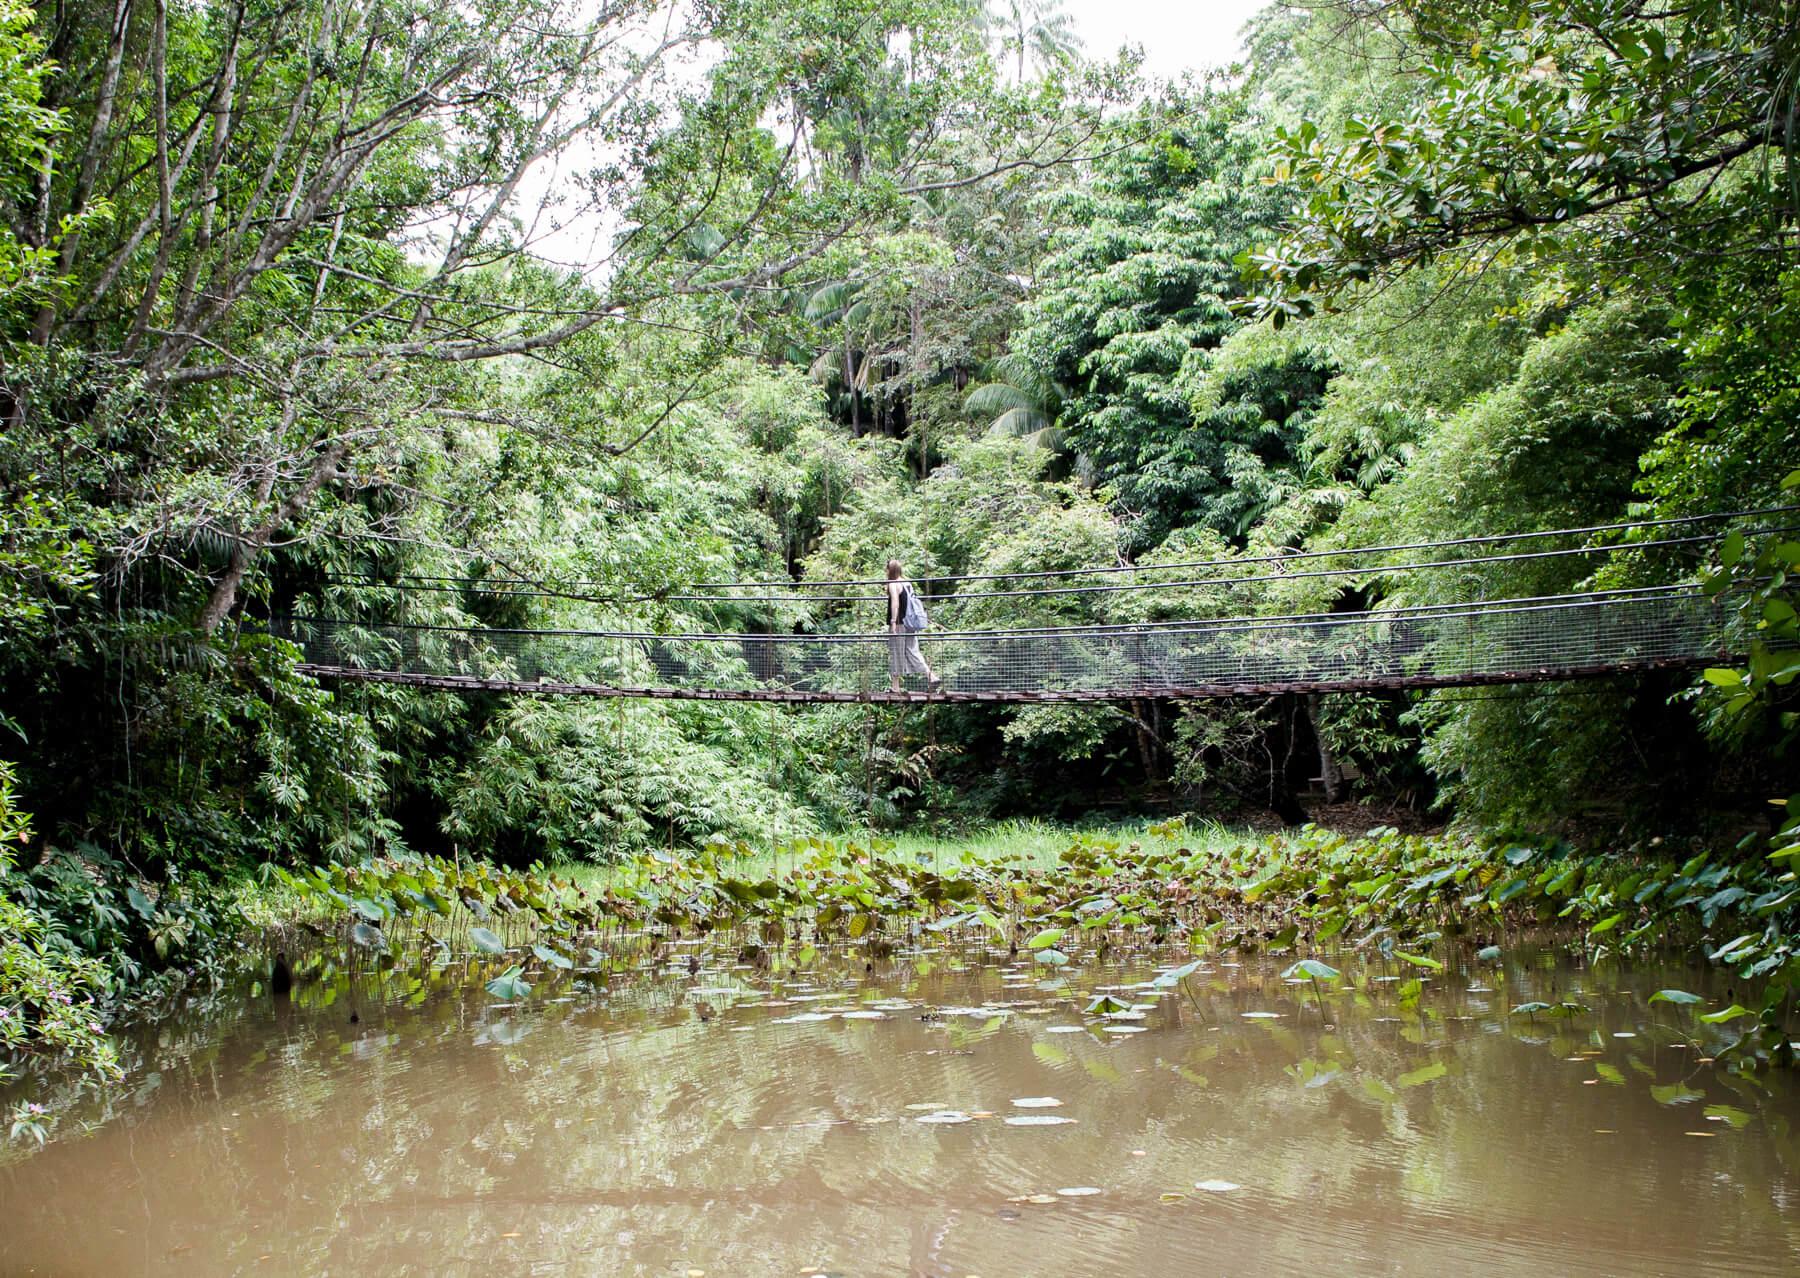 Girl walking across rope bridge in Borneo